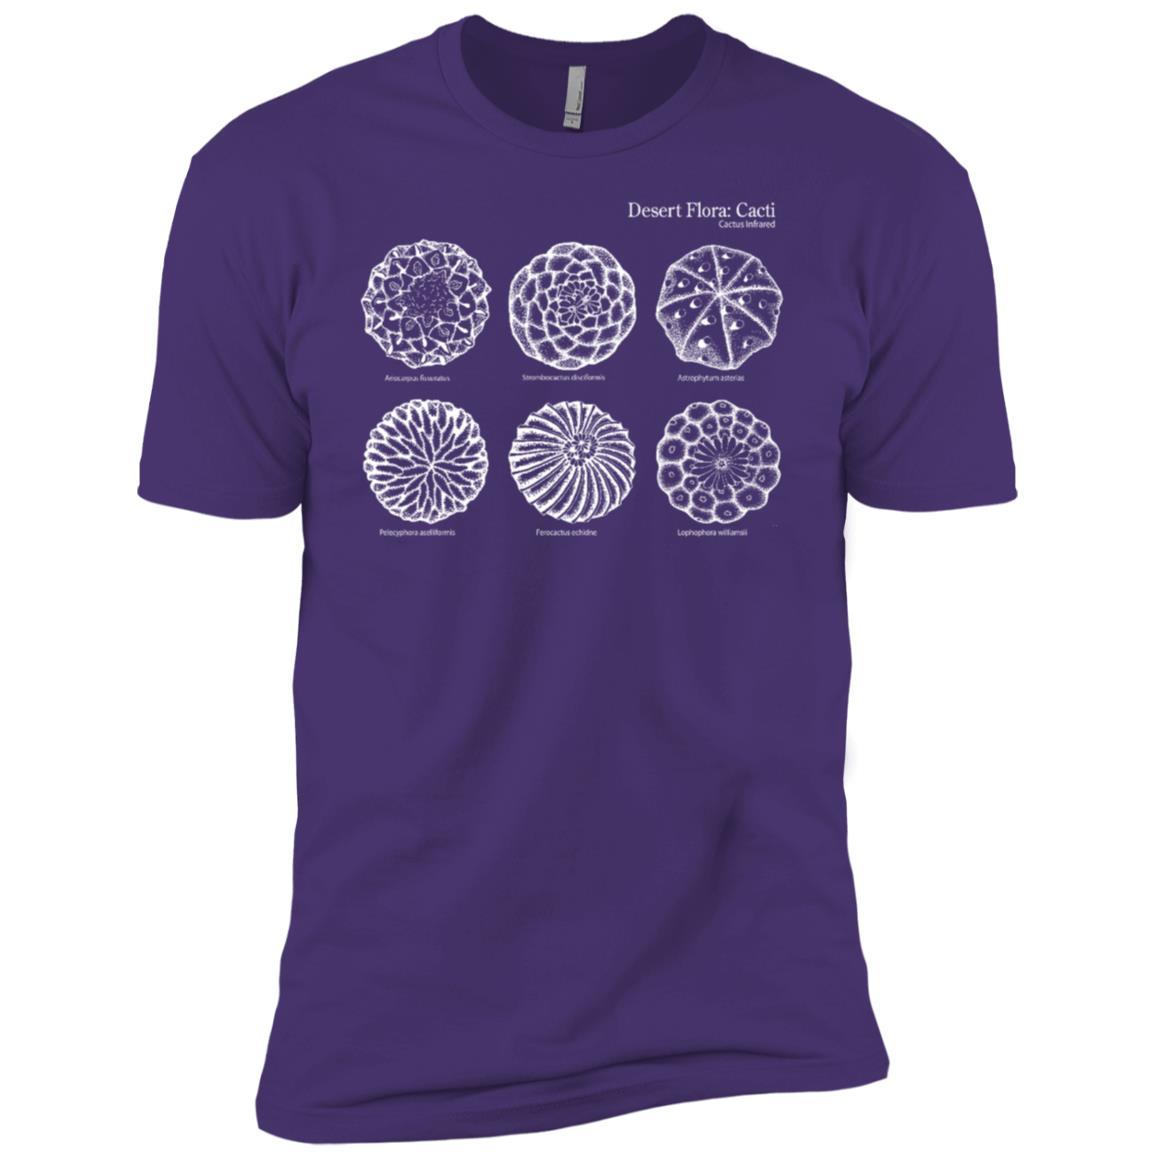 Desert Cacti, Lophophora williamsii peyote cactus 5 more Men Short Sleeve T-Shirt